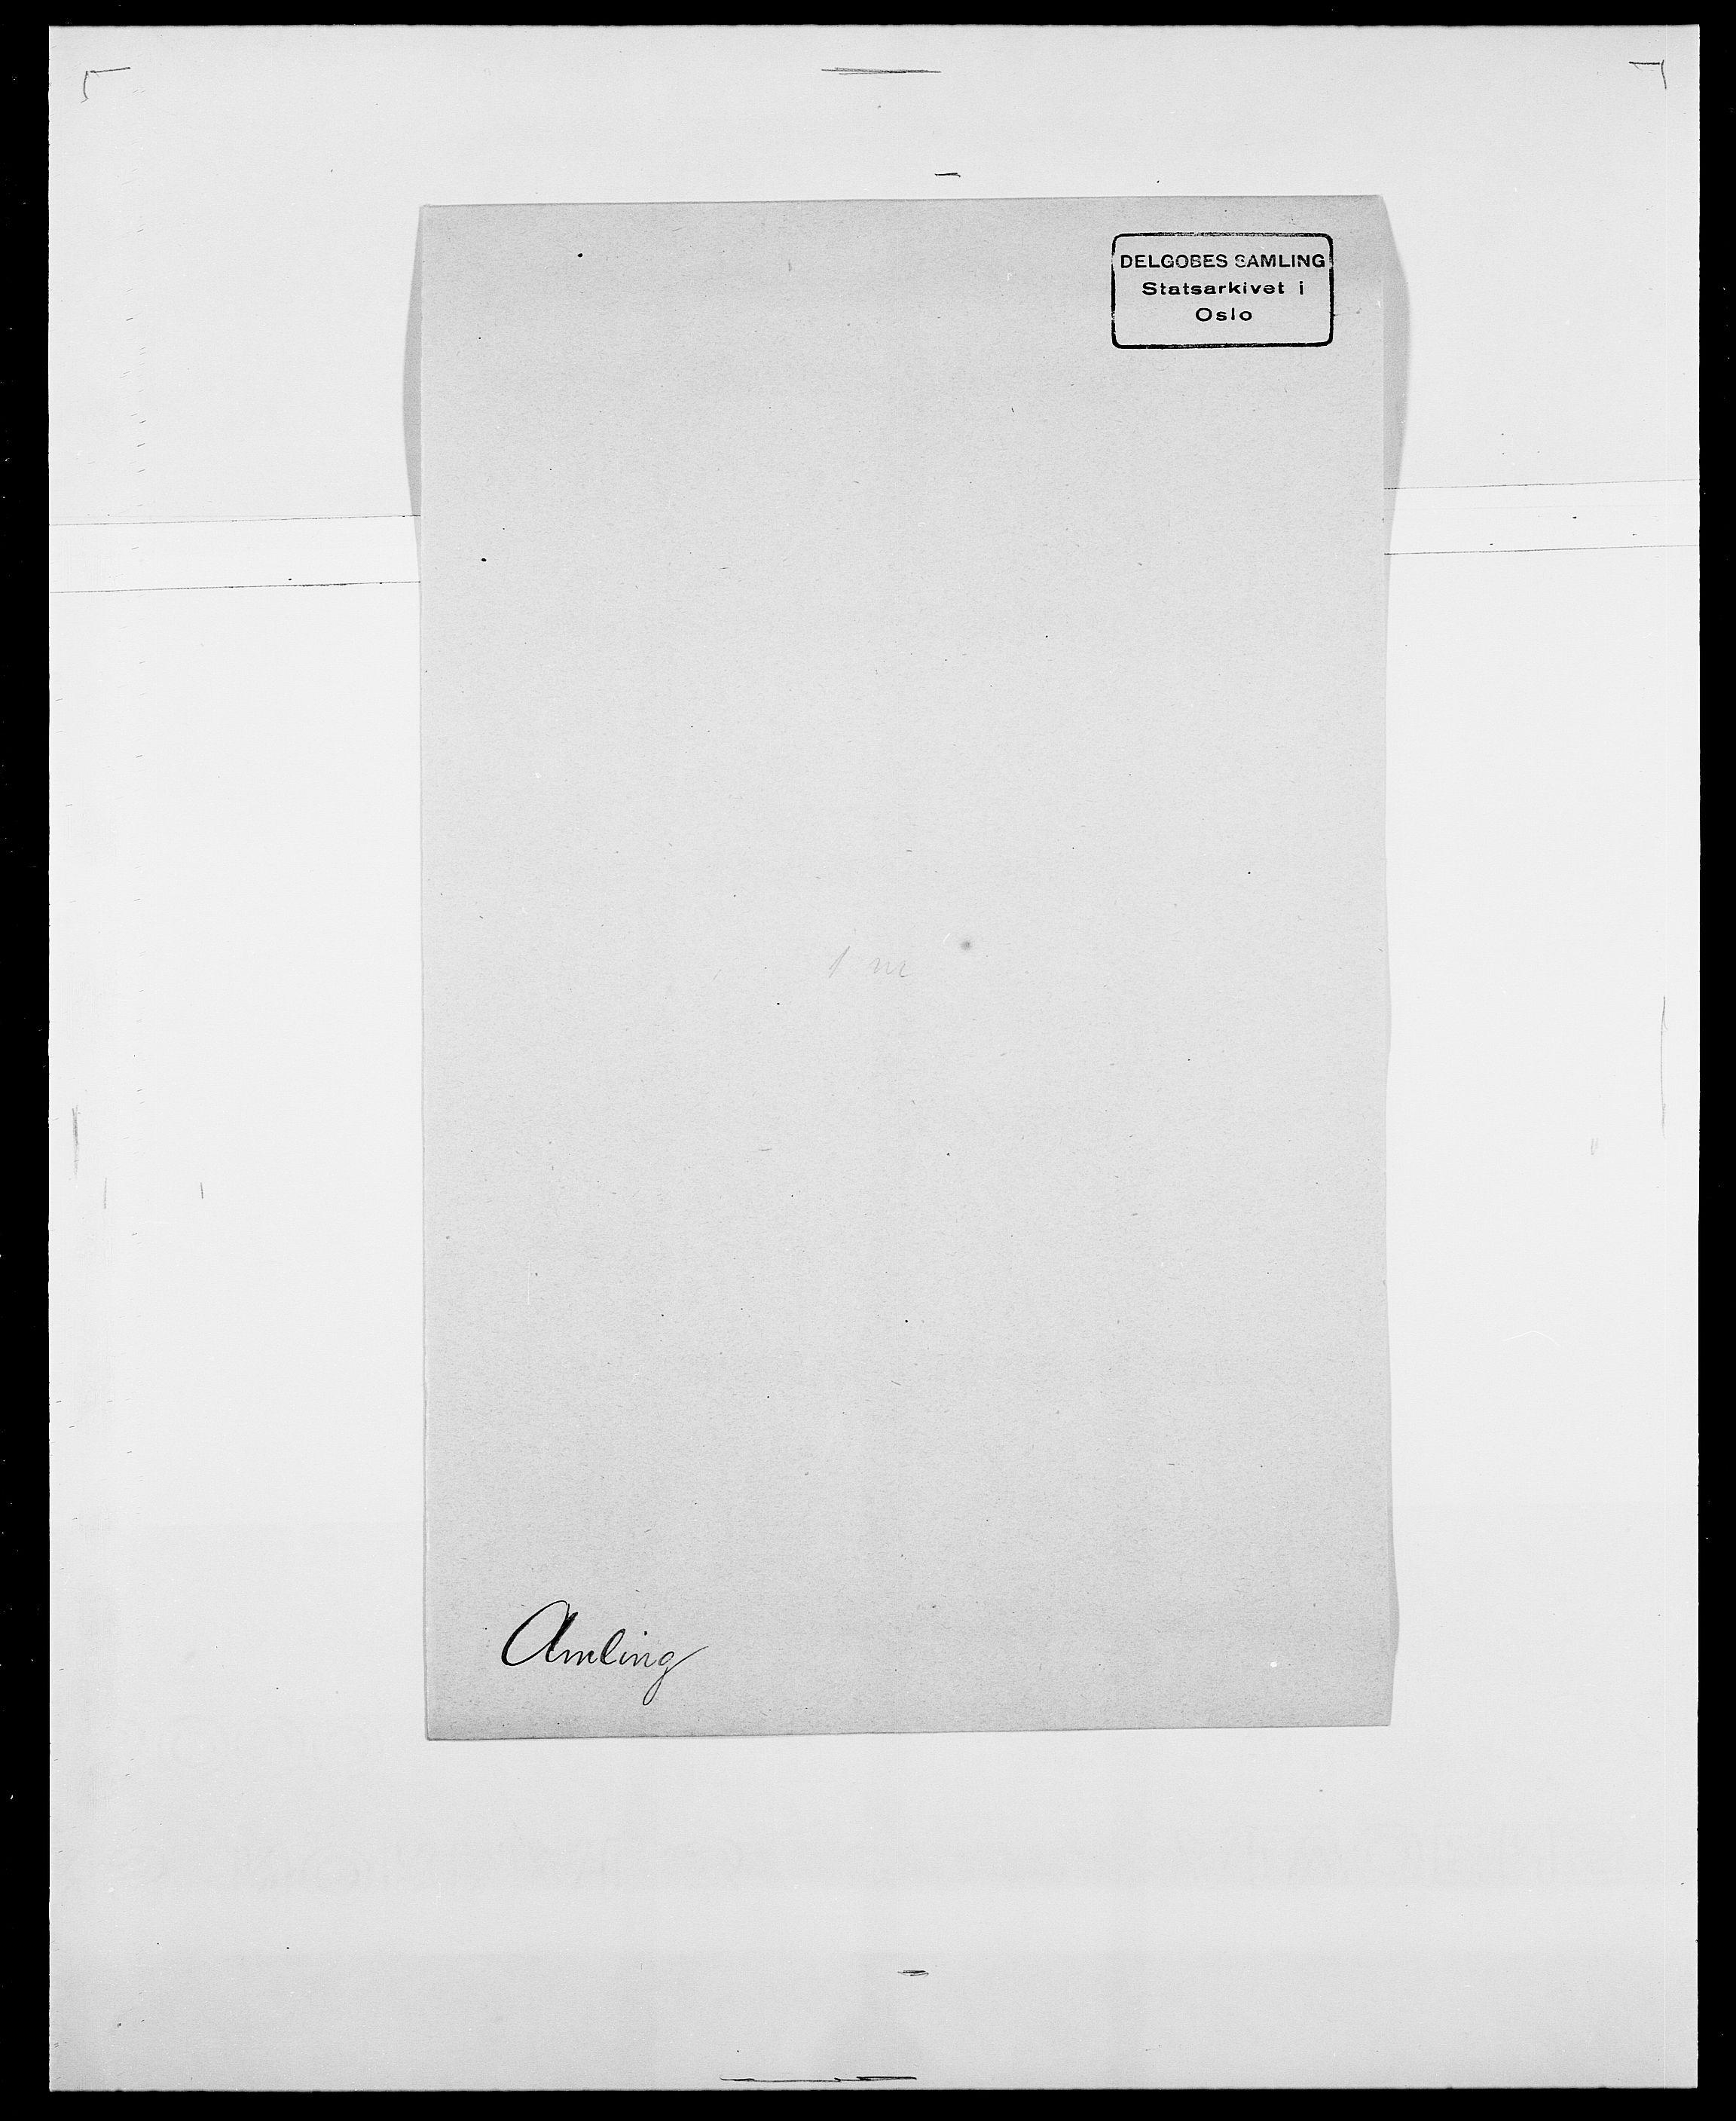 SAO, Delgobe, Charles Antoine - samling, D/Da/L0001: Aabye - Angerman, s. 542